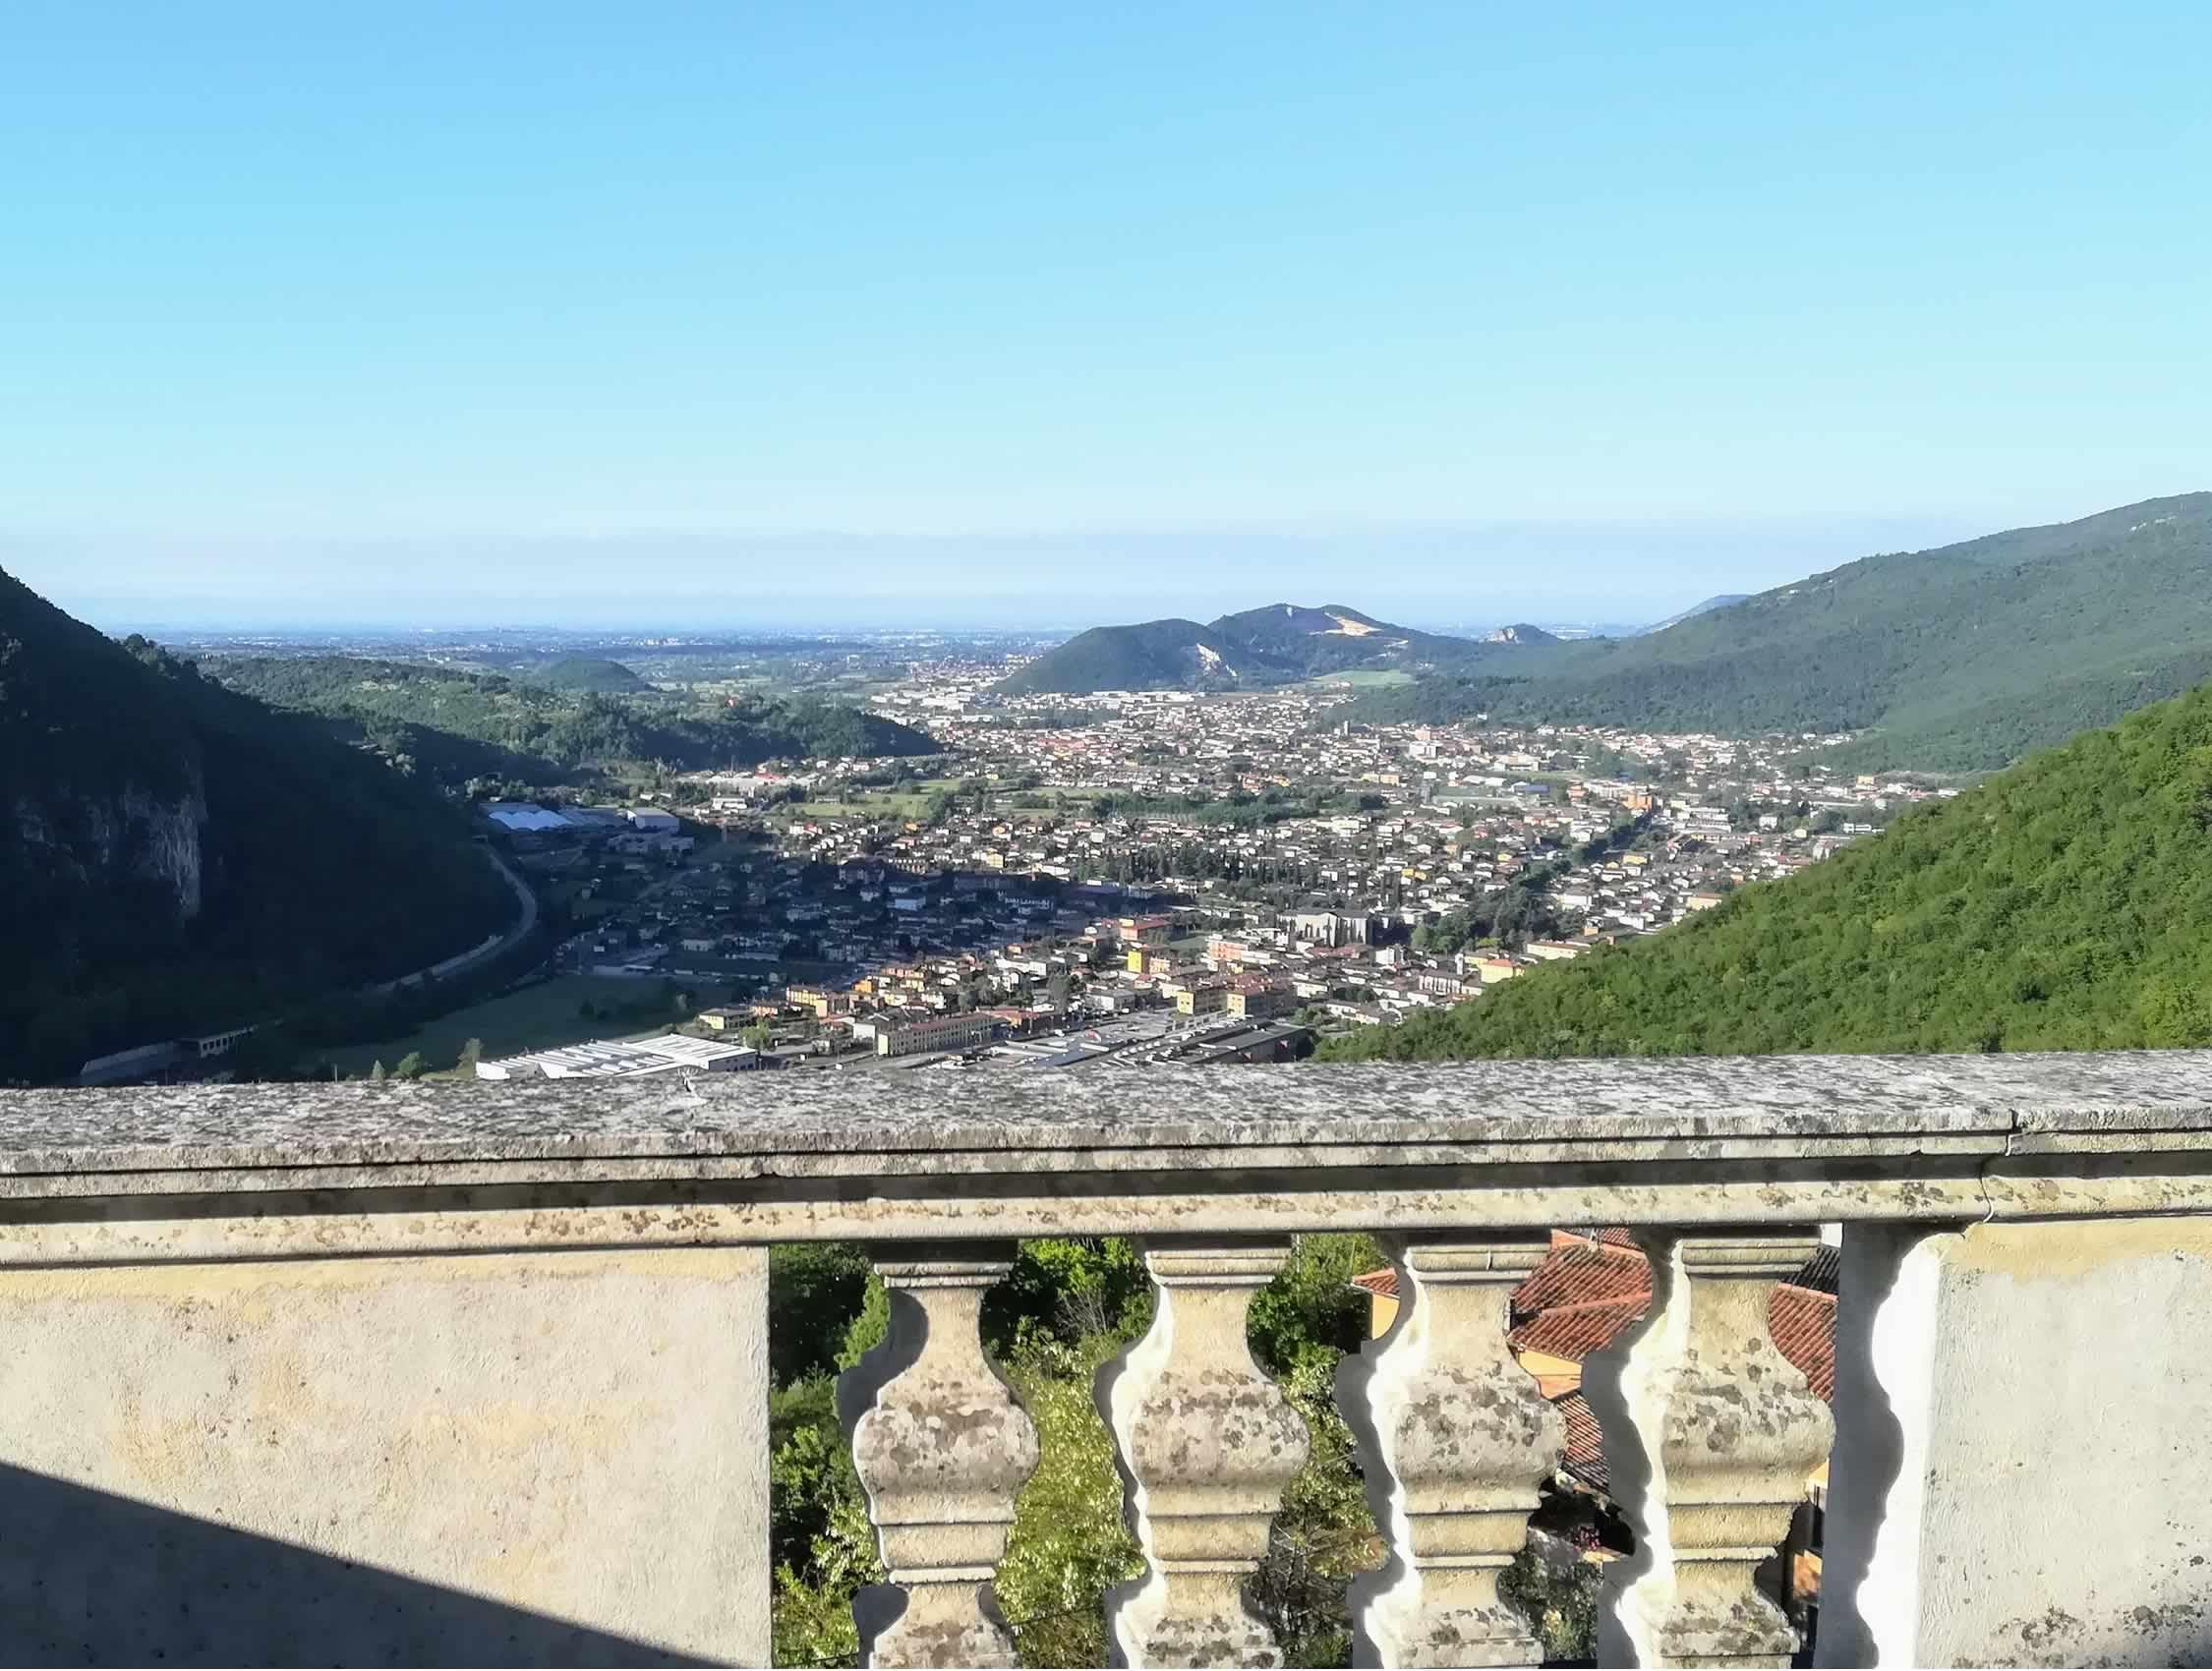 panoramica su Gavardo e Villanuova s/c